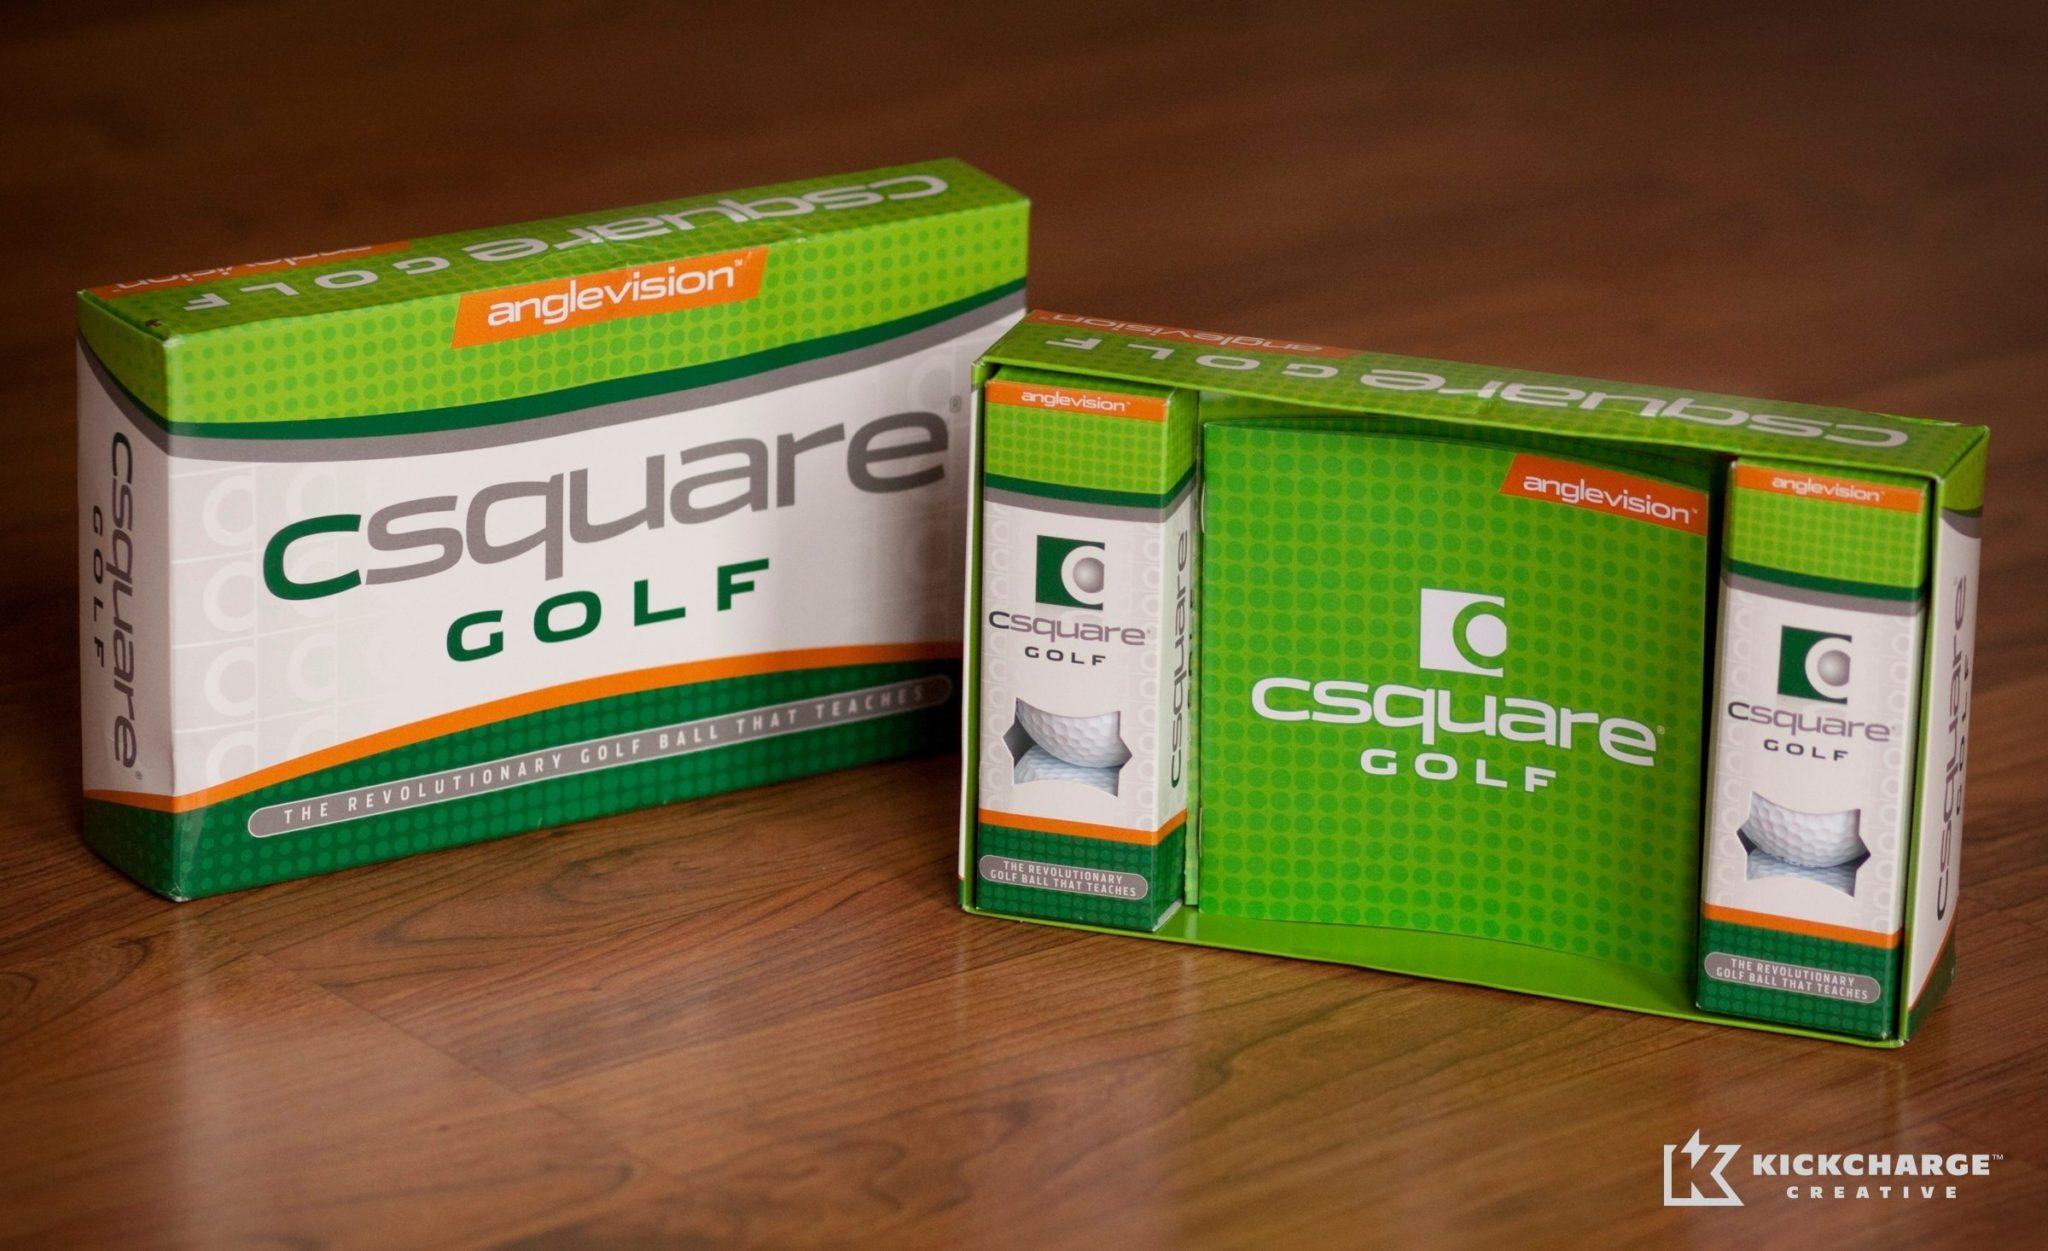 CSquared Golf